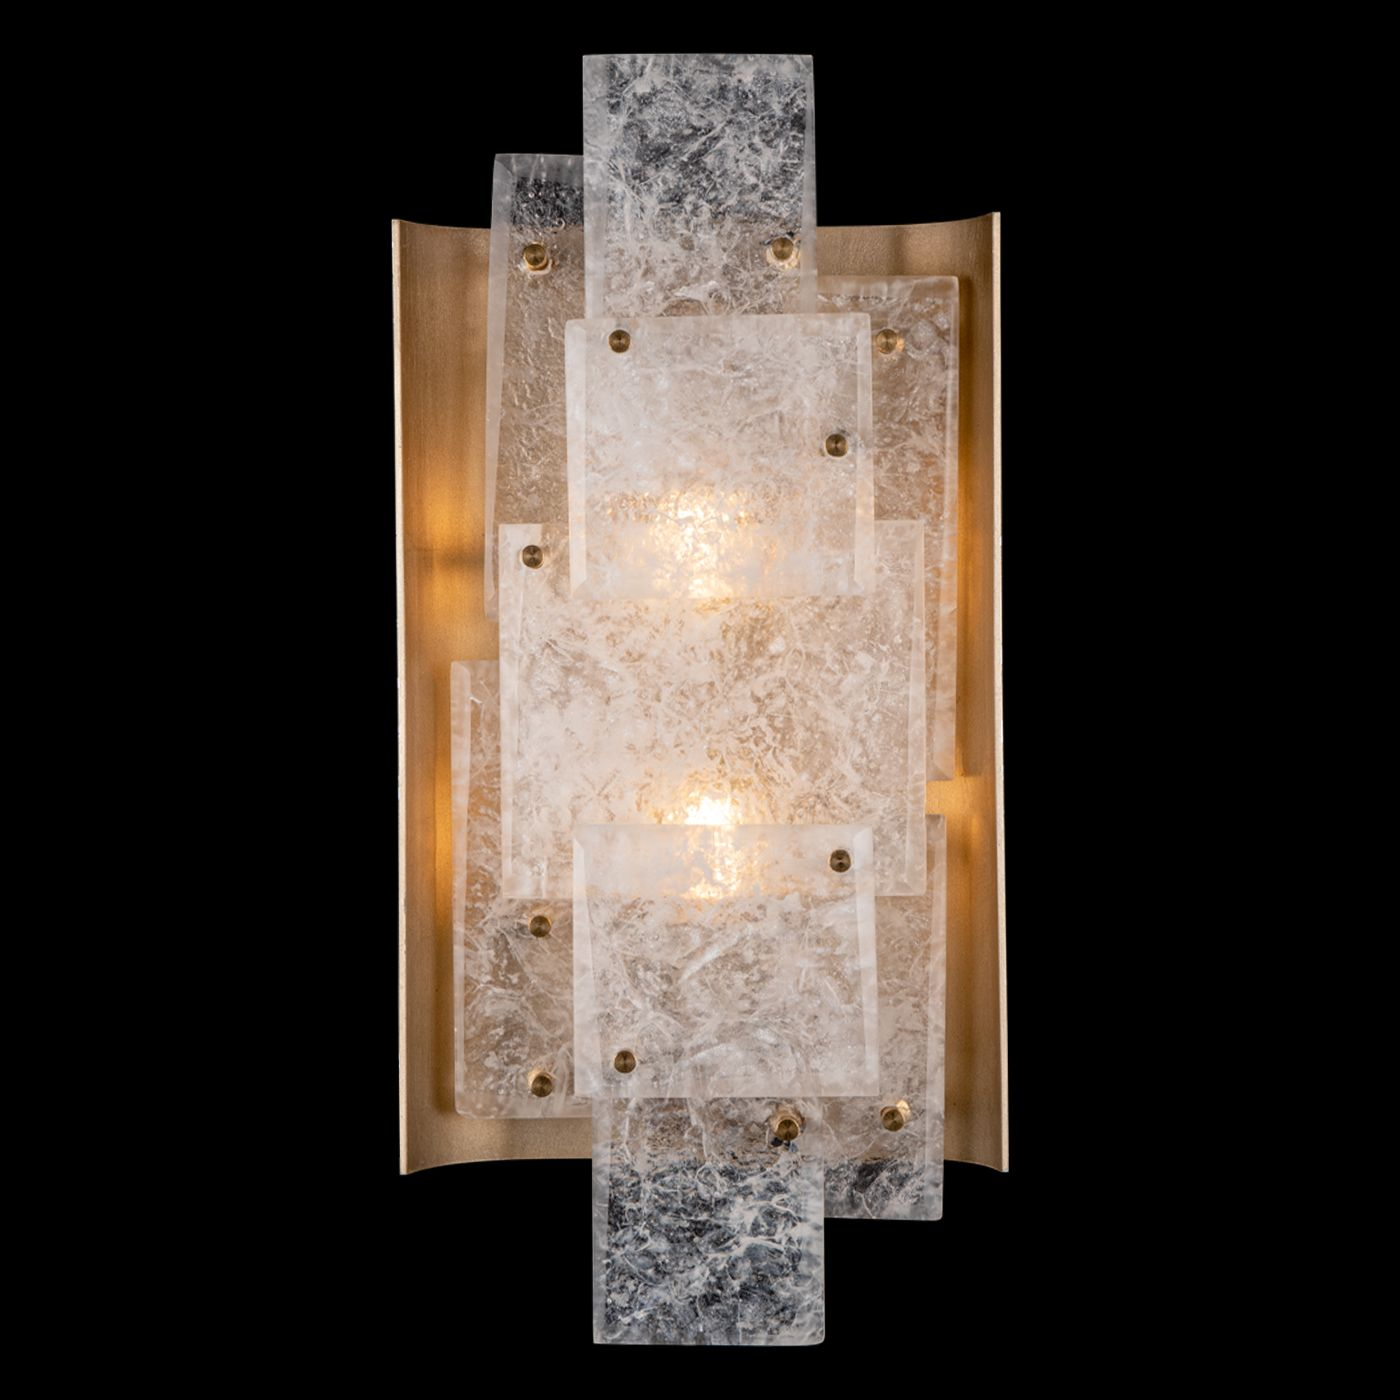 Lunea Sconces By Erinn V For Fine Art Lamps Fine Art Lamps Wall Sconces Sconces